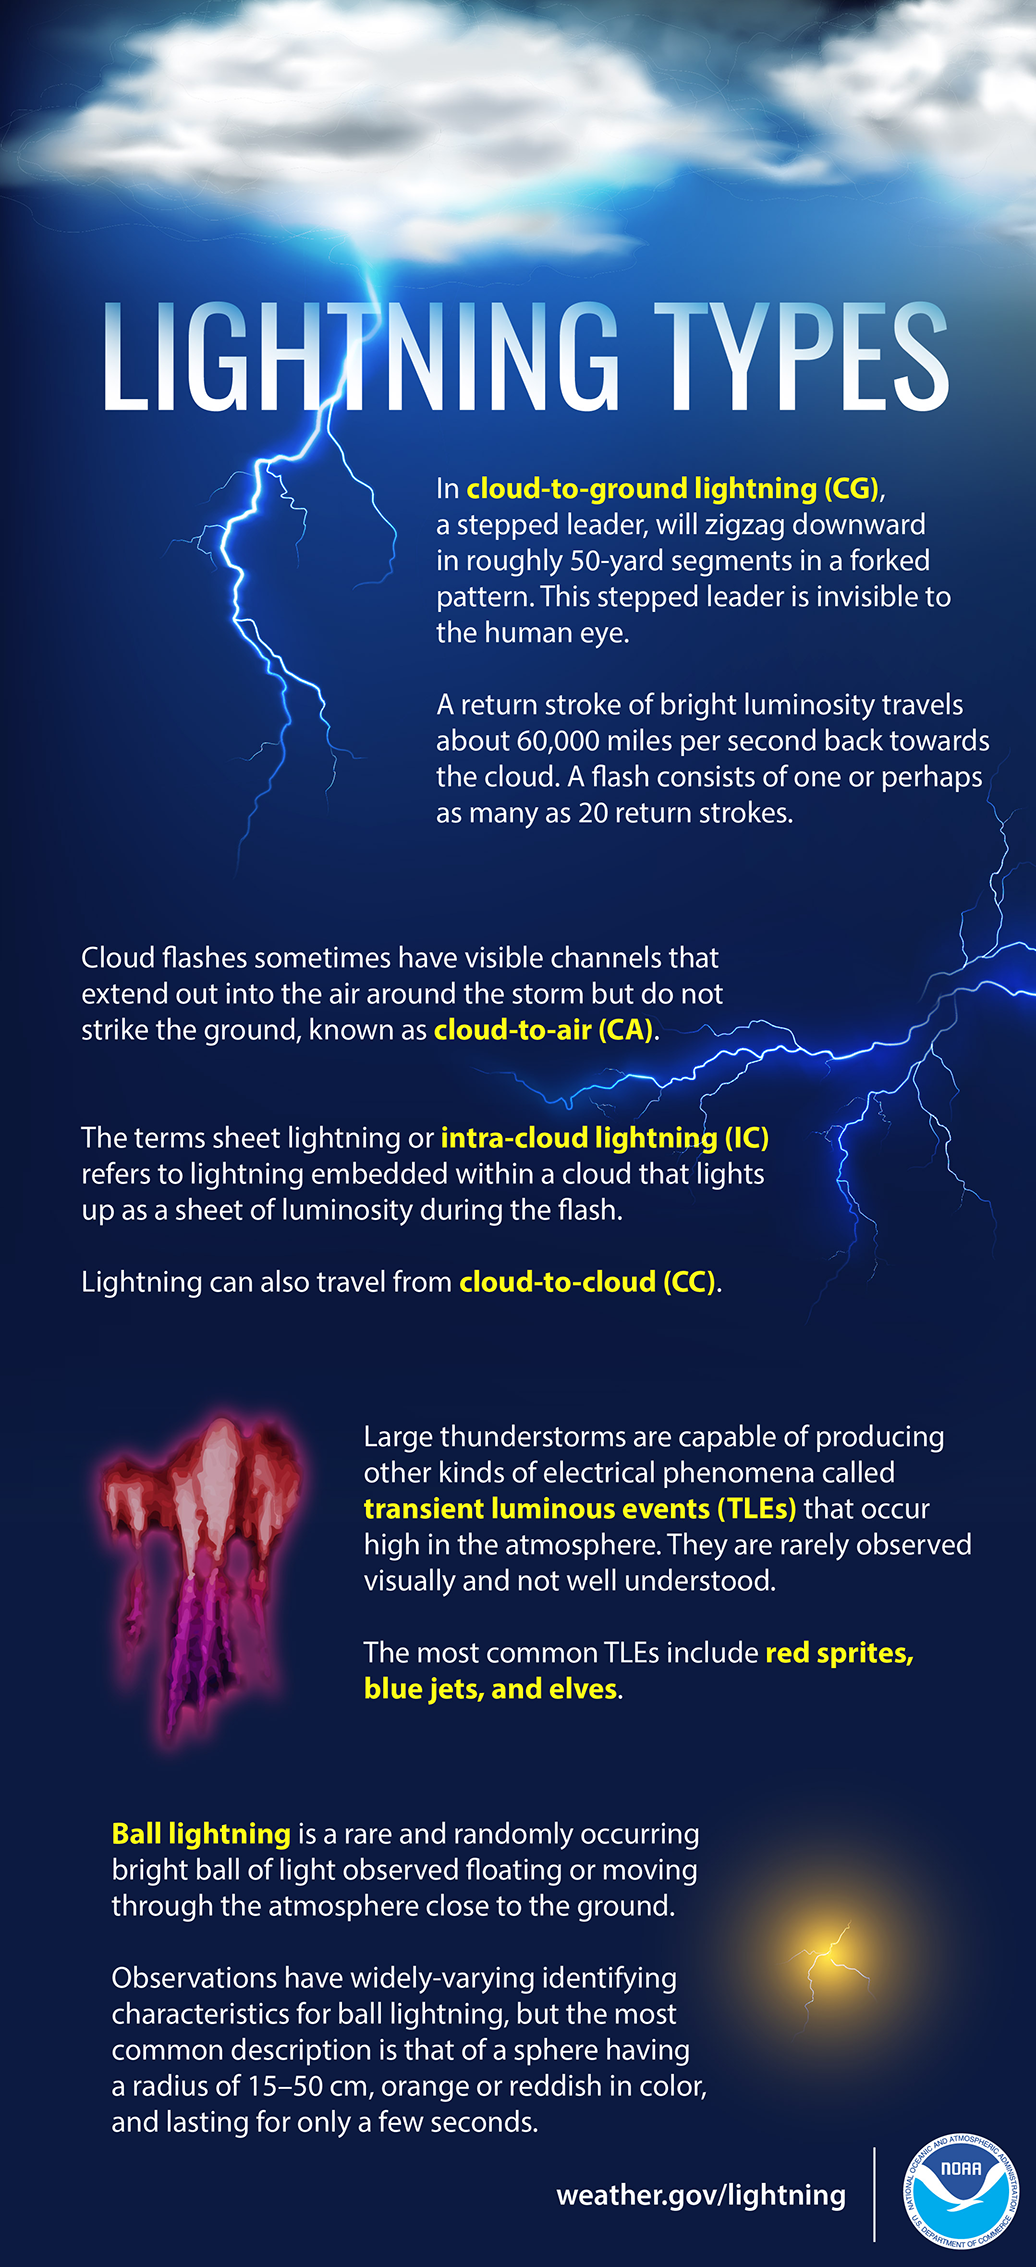 Lightning types